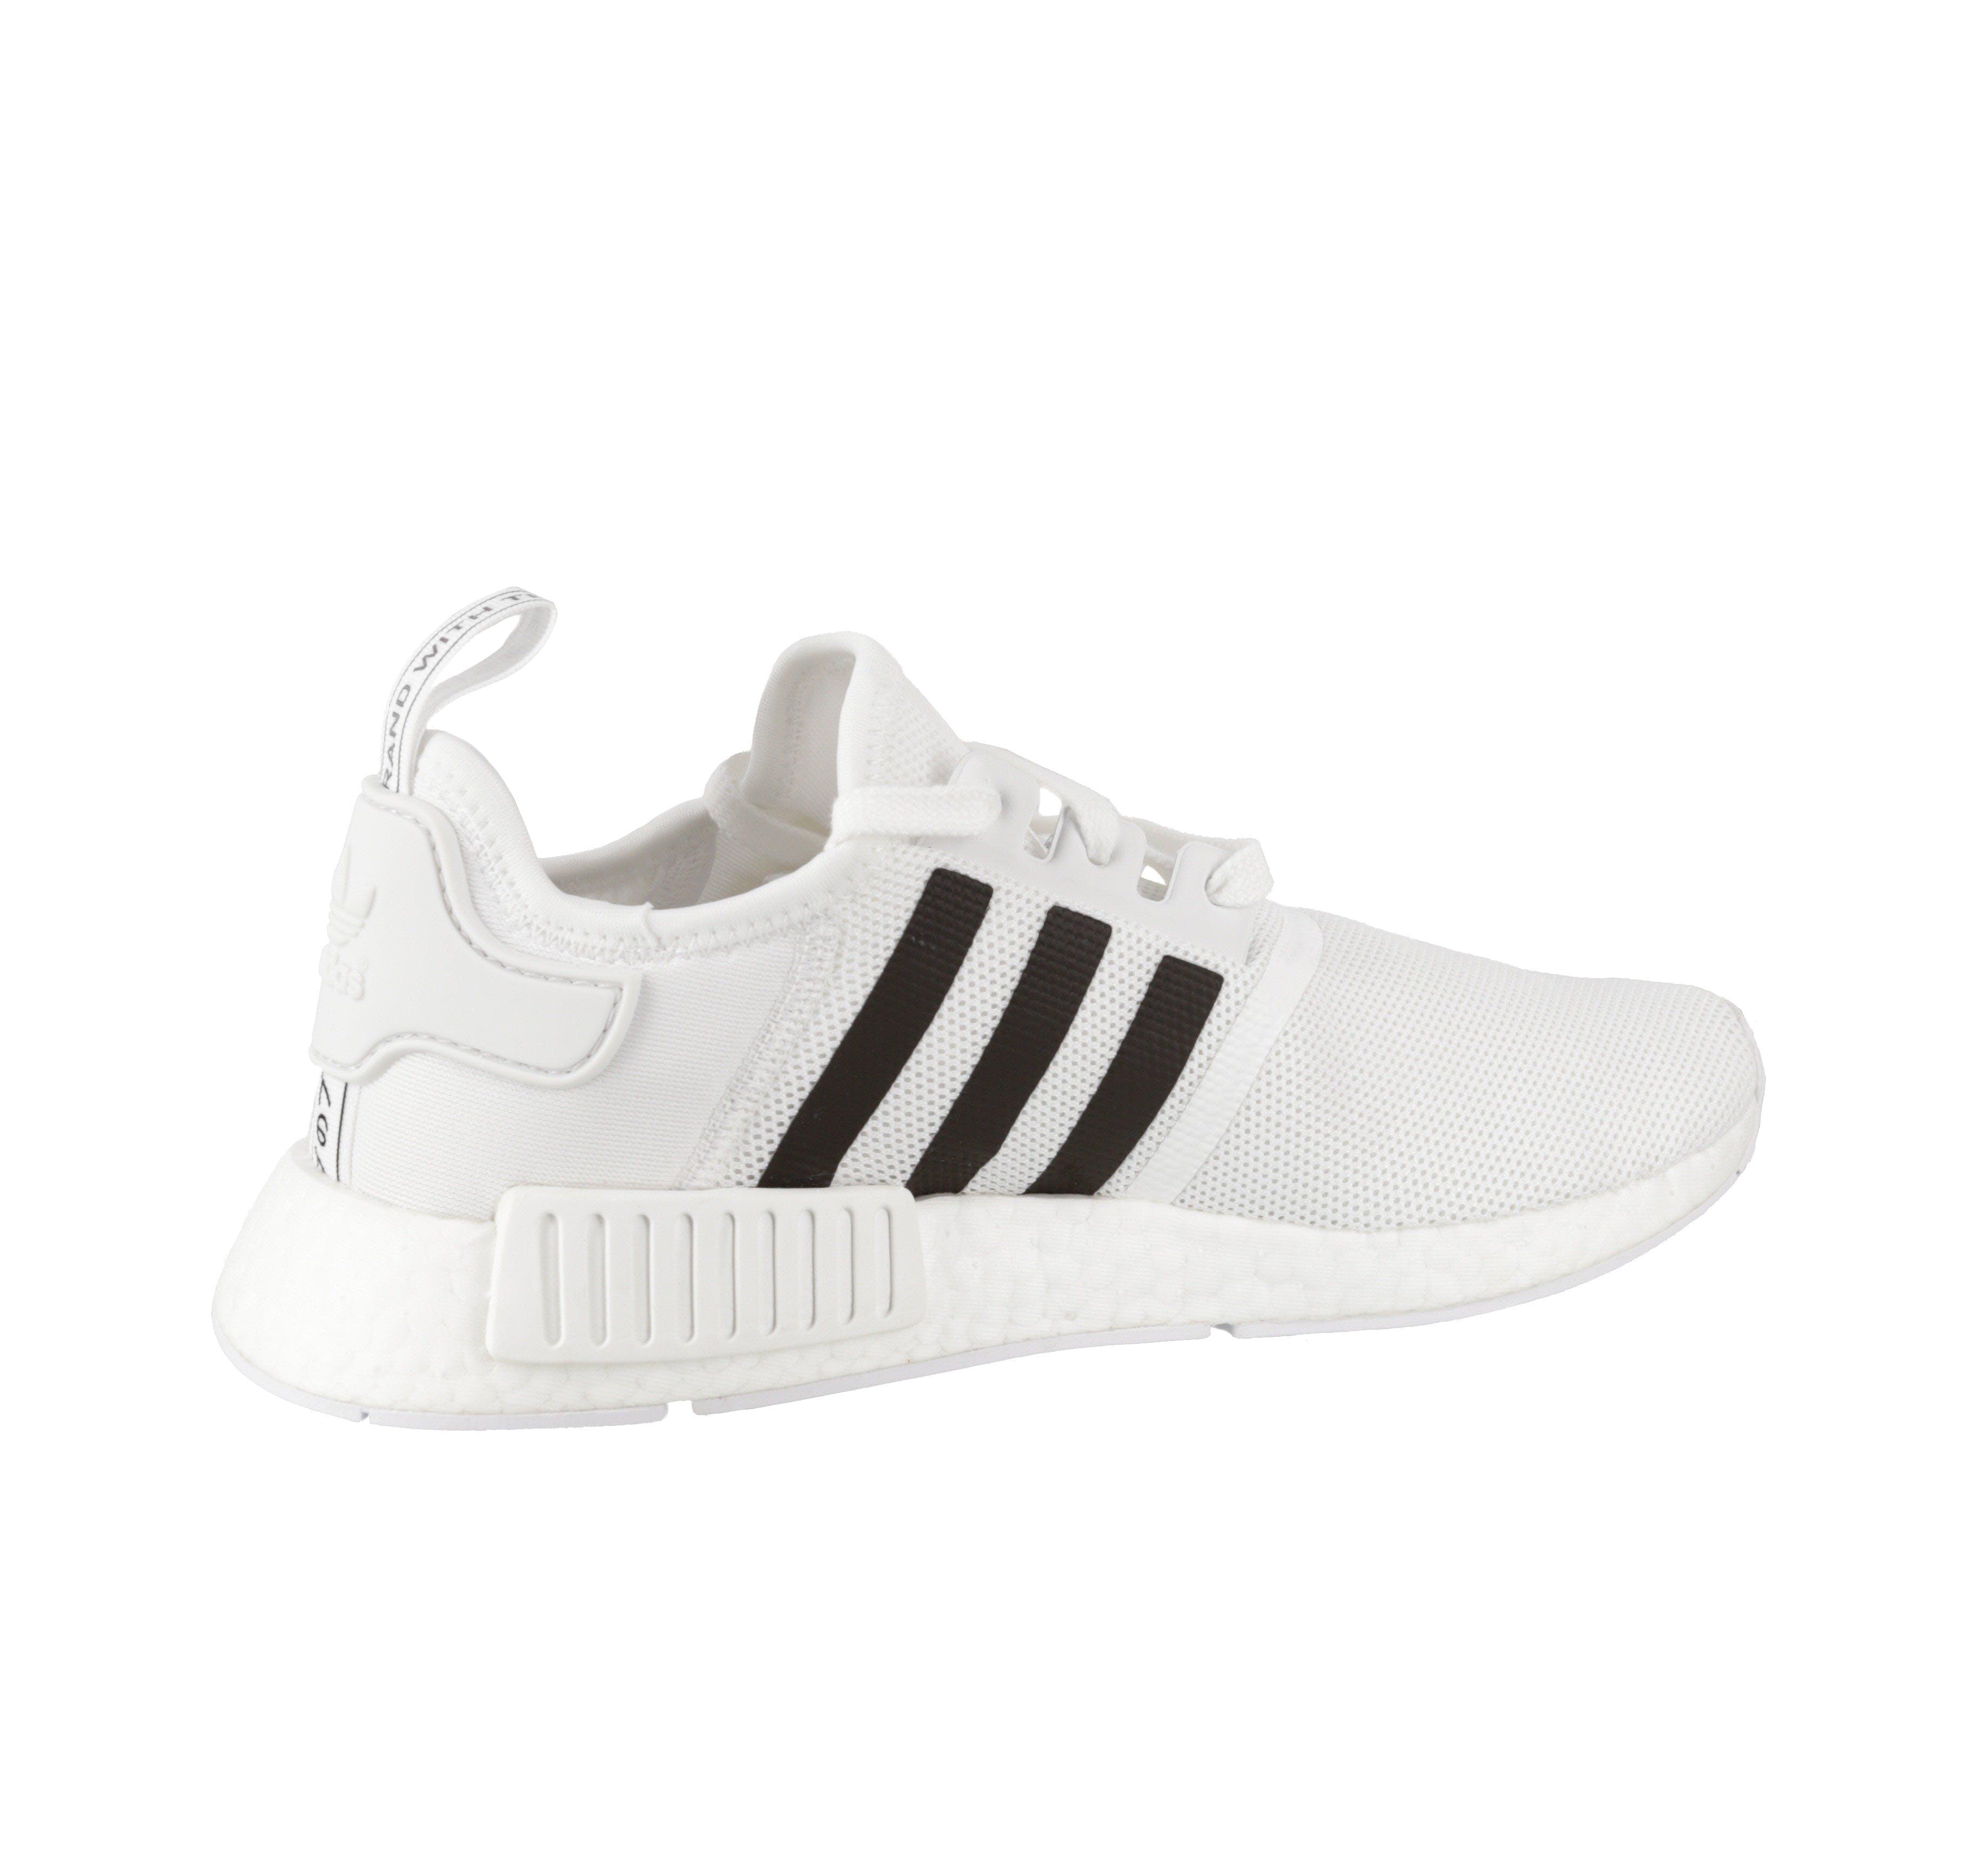 Adidas Originals Nmd R1 White White Cq2411 Culture Kings Us